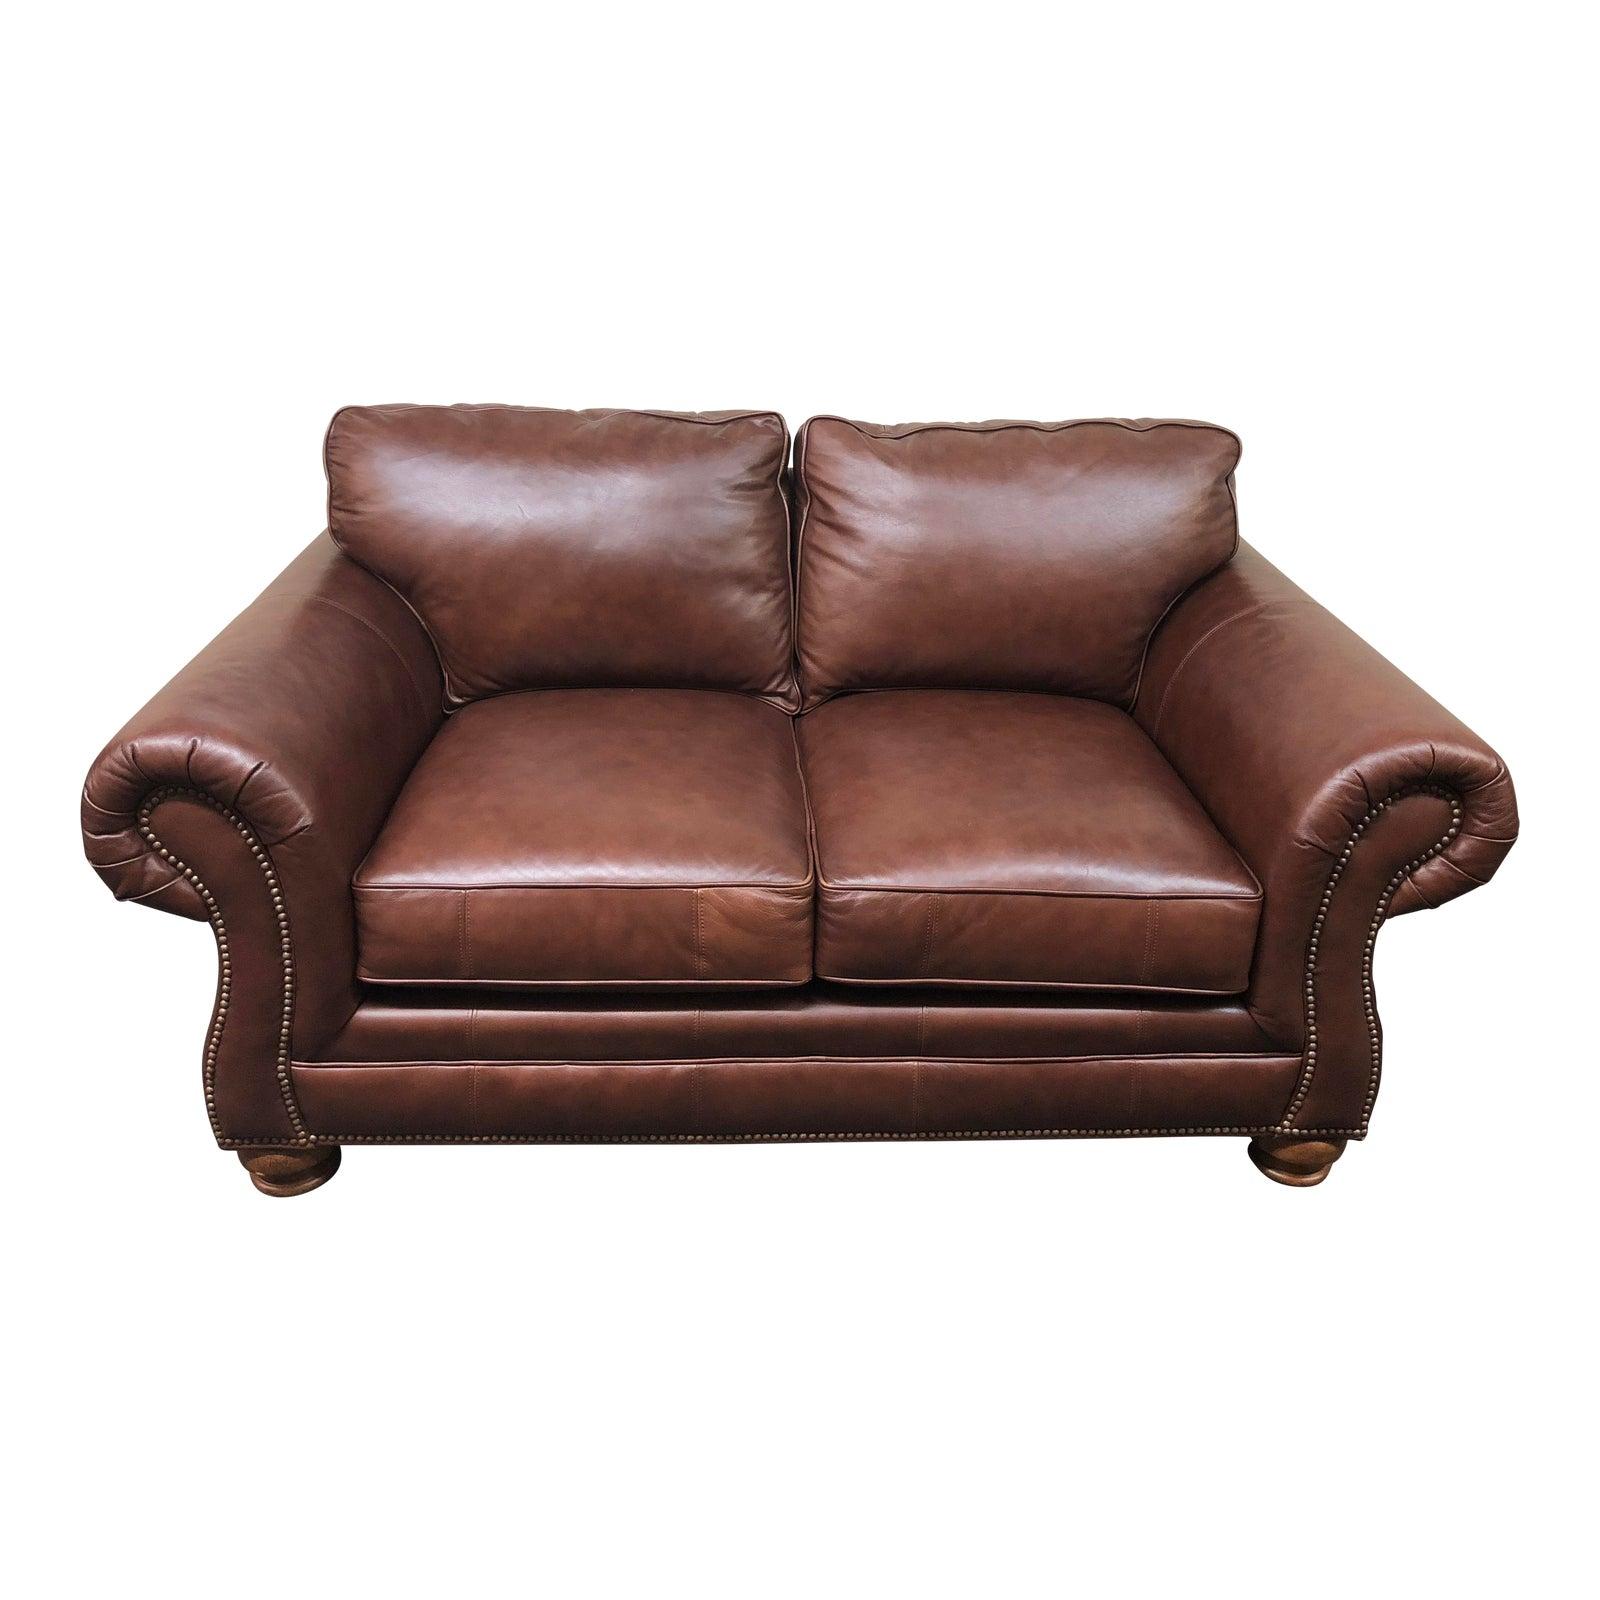 Bassett furniture roll arm leather loveseat chairish